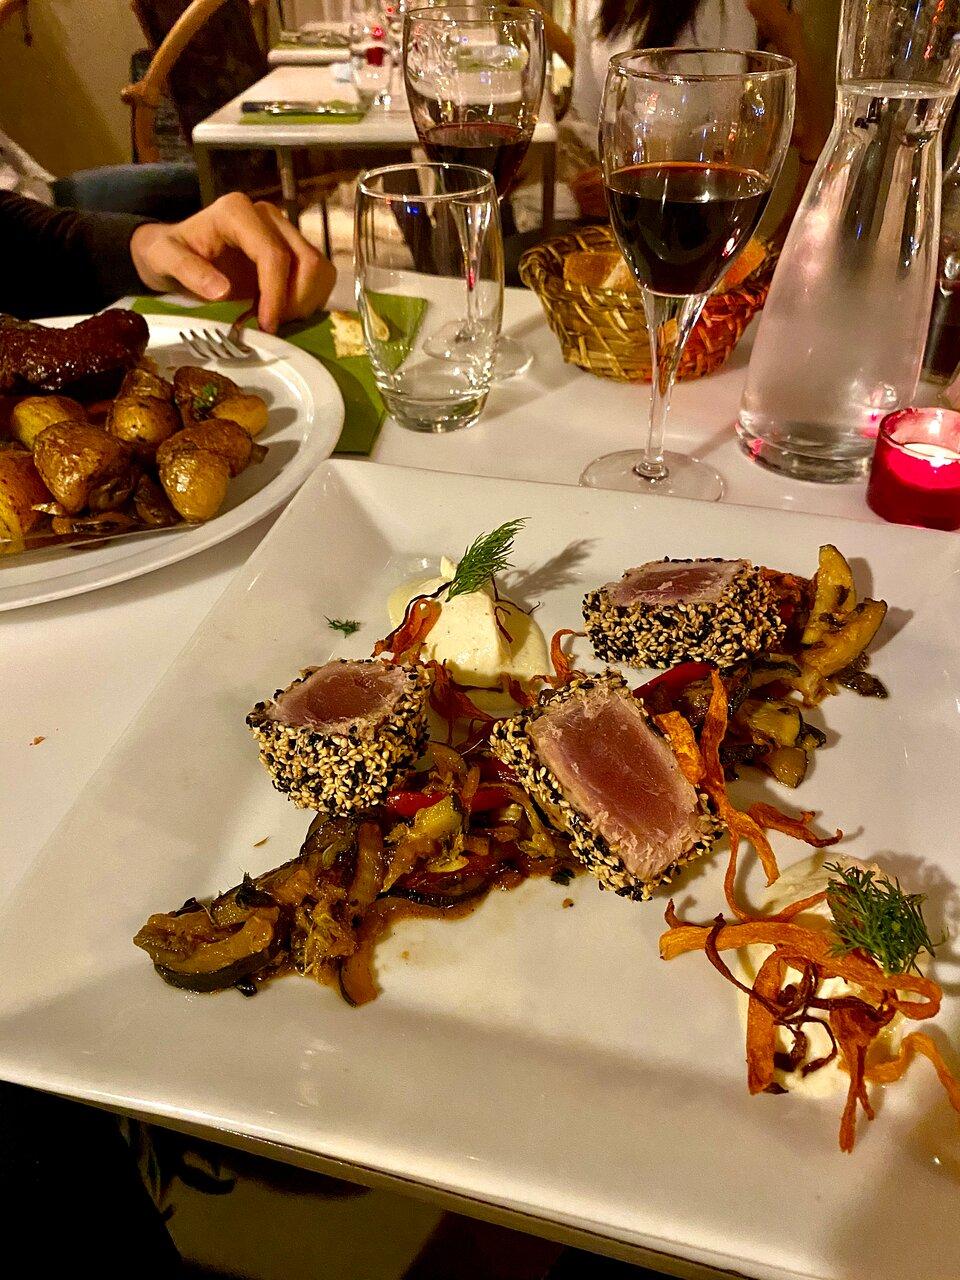 Sur Un Arbre Perché Restaurant : arbre, perché, restaurant, Cevice, Sauvage, Photo, Arbre, Perché,, Paris, Tripadvisor